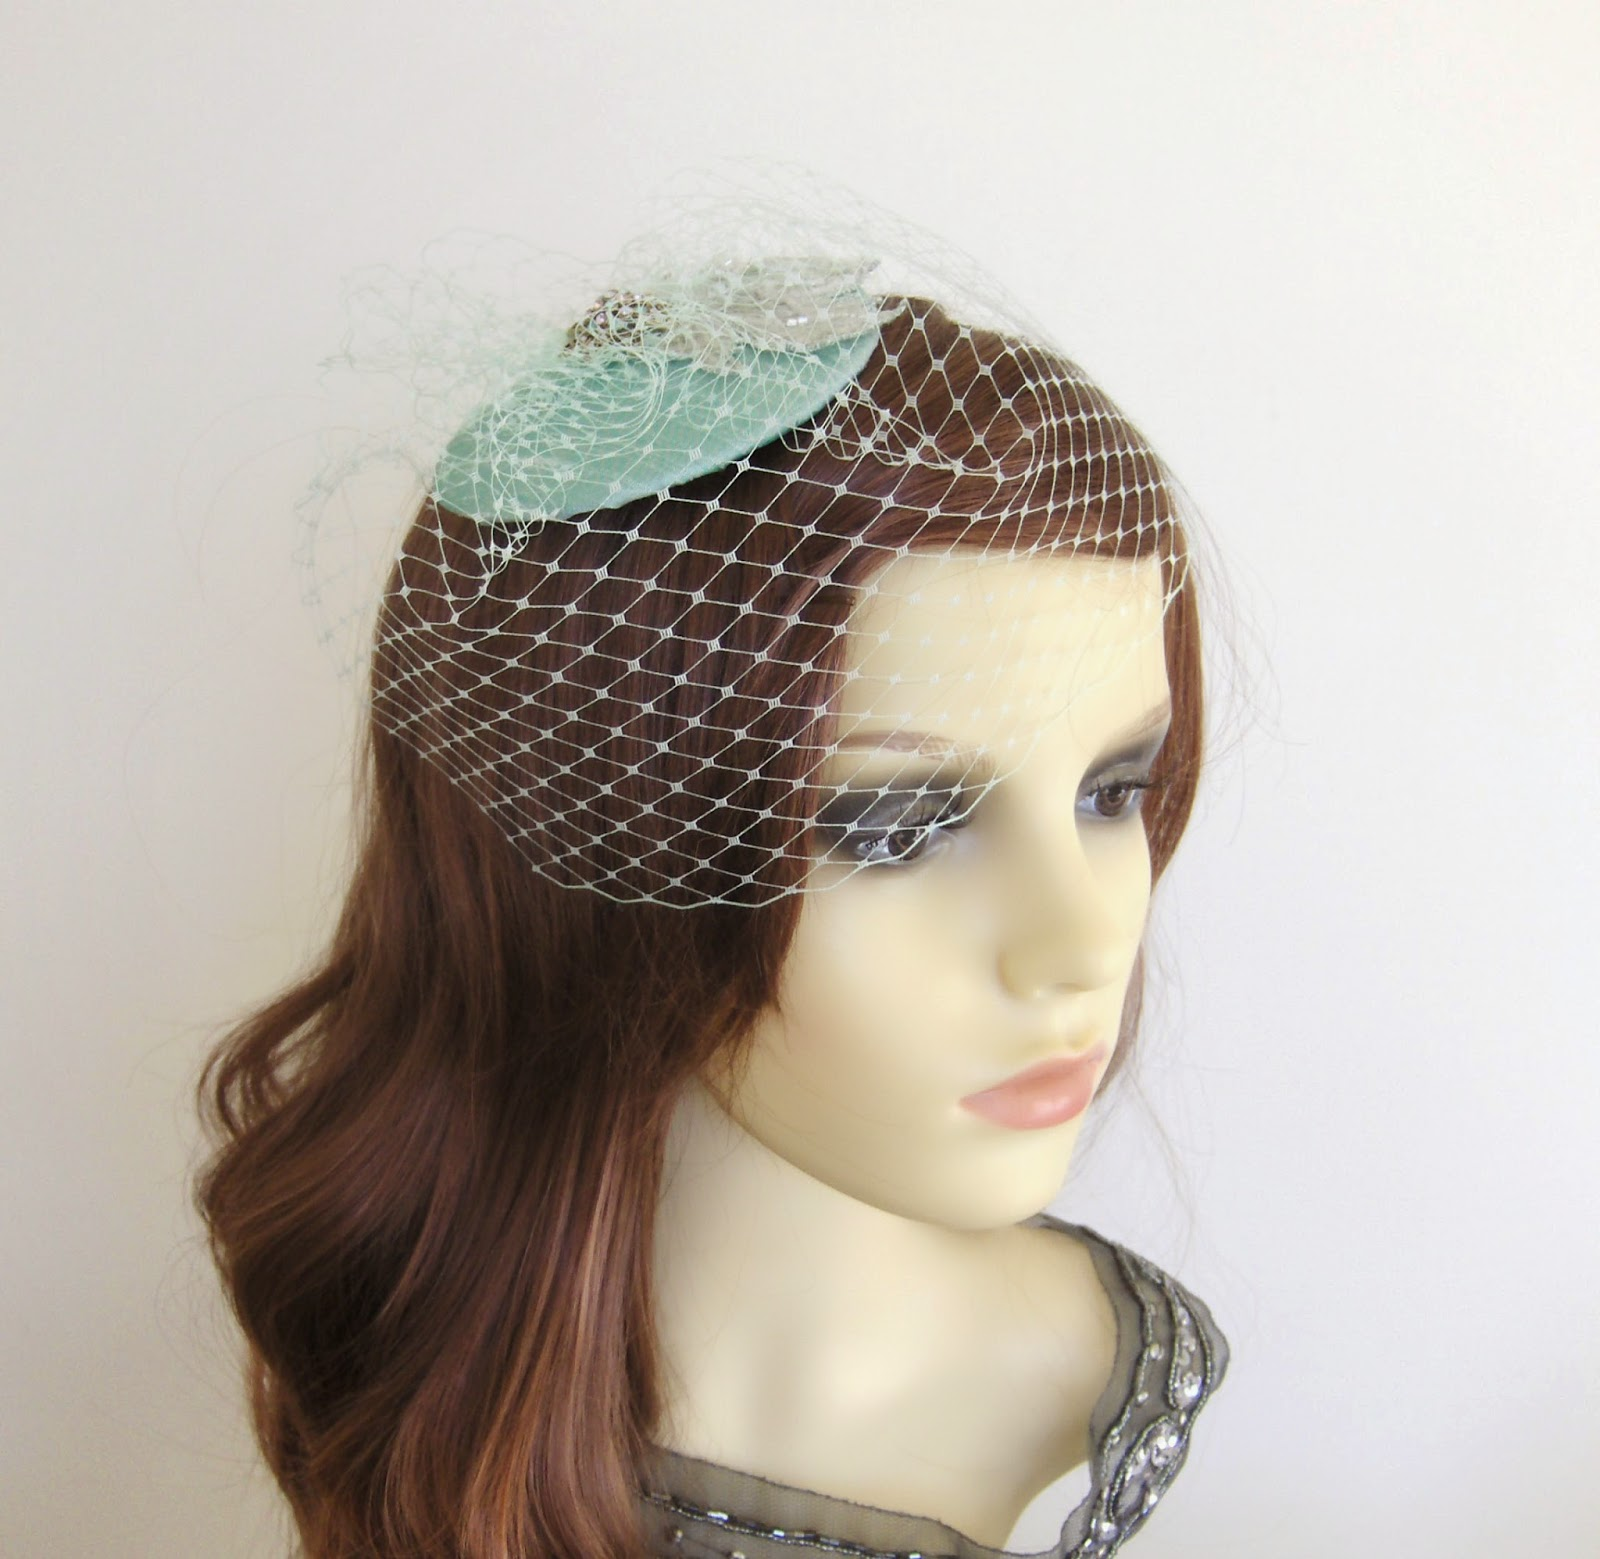 https://www.etsy.com/uk/listing/175607061/mint-green-veil-cocktail-hat?ref=shop_home_active_9